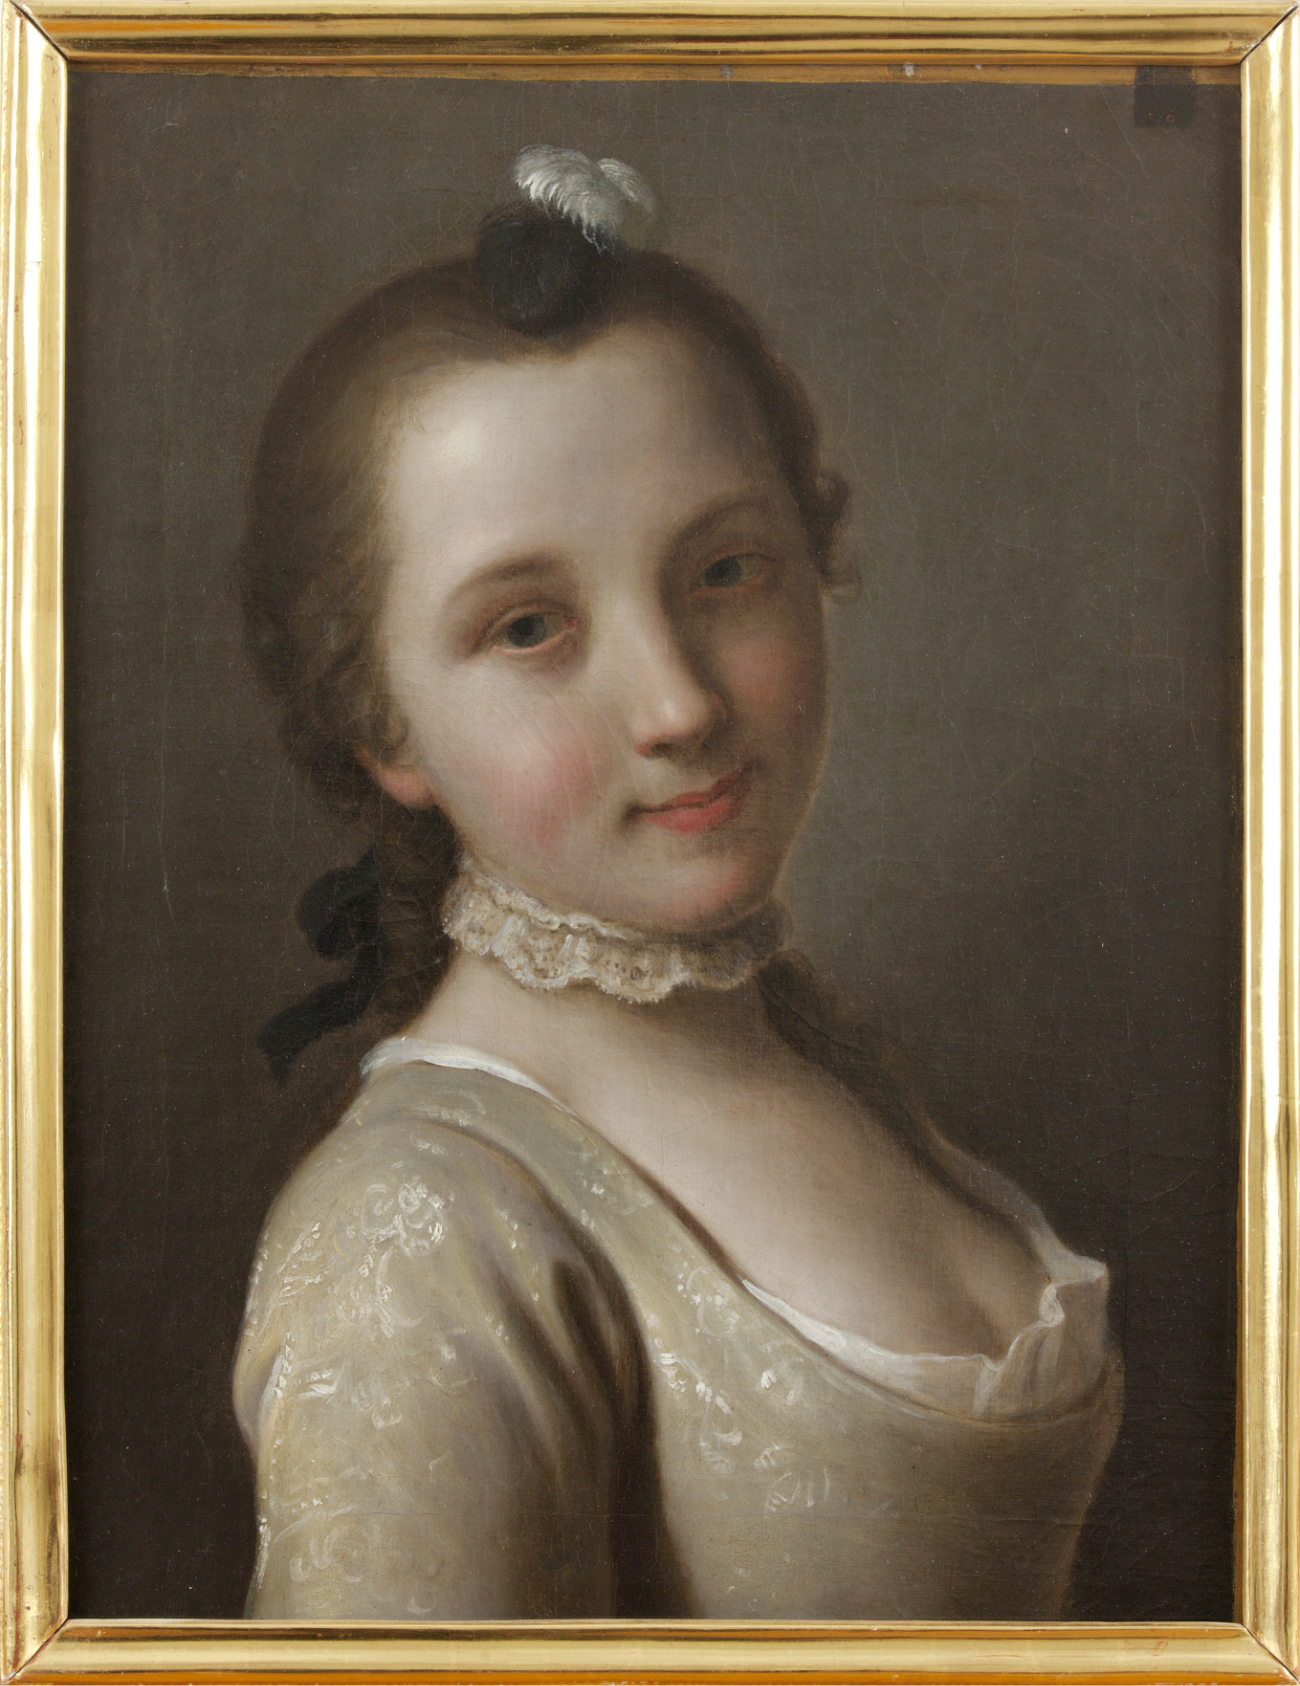 Pietro Antonio Rotari. Fanciulla con piuma tra i capelli. 1756-1762\n